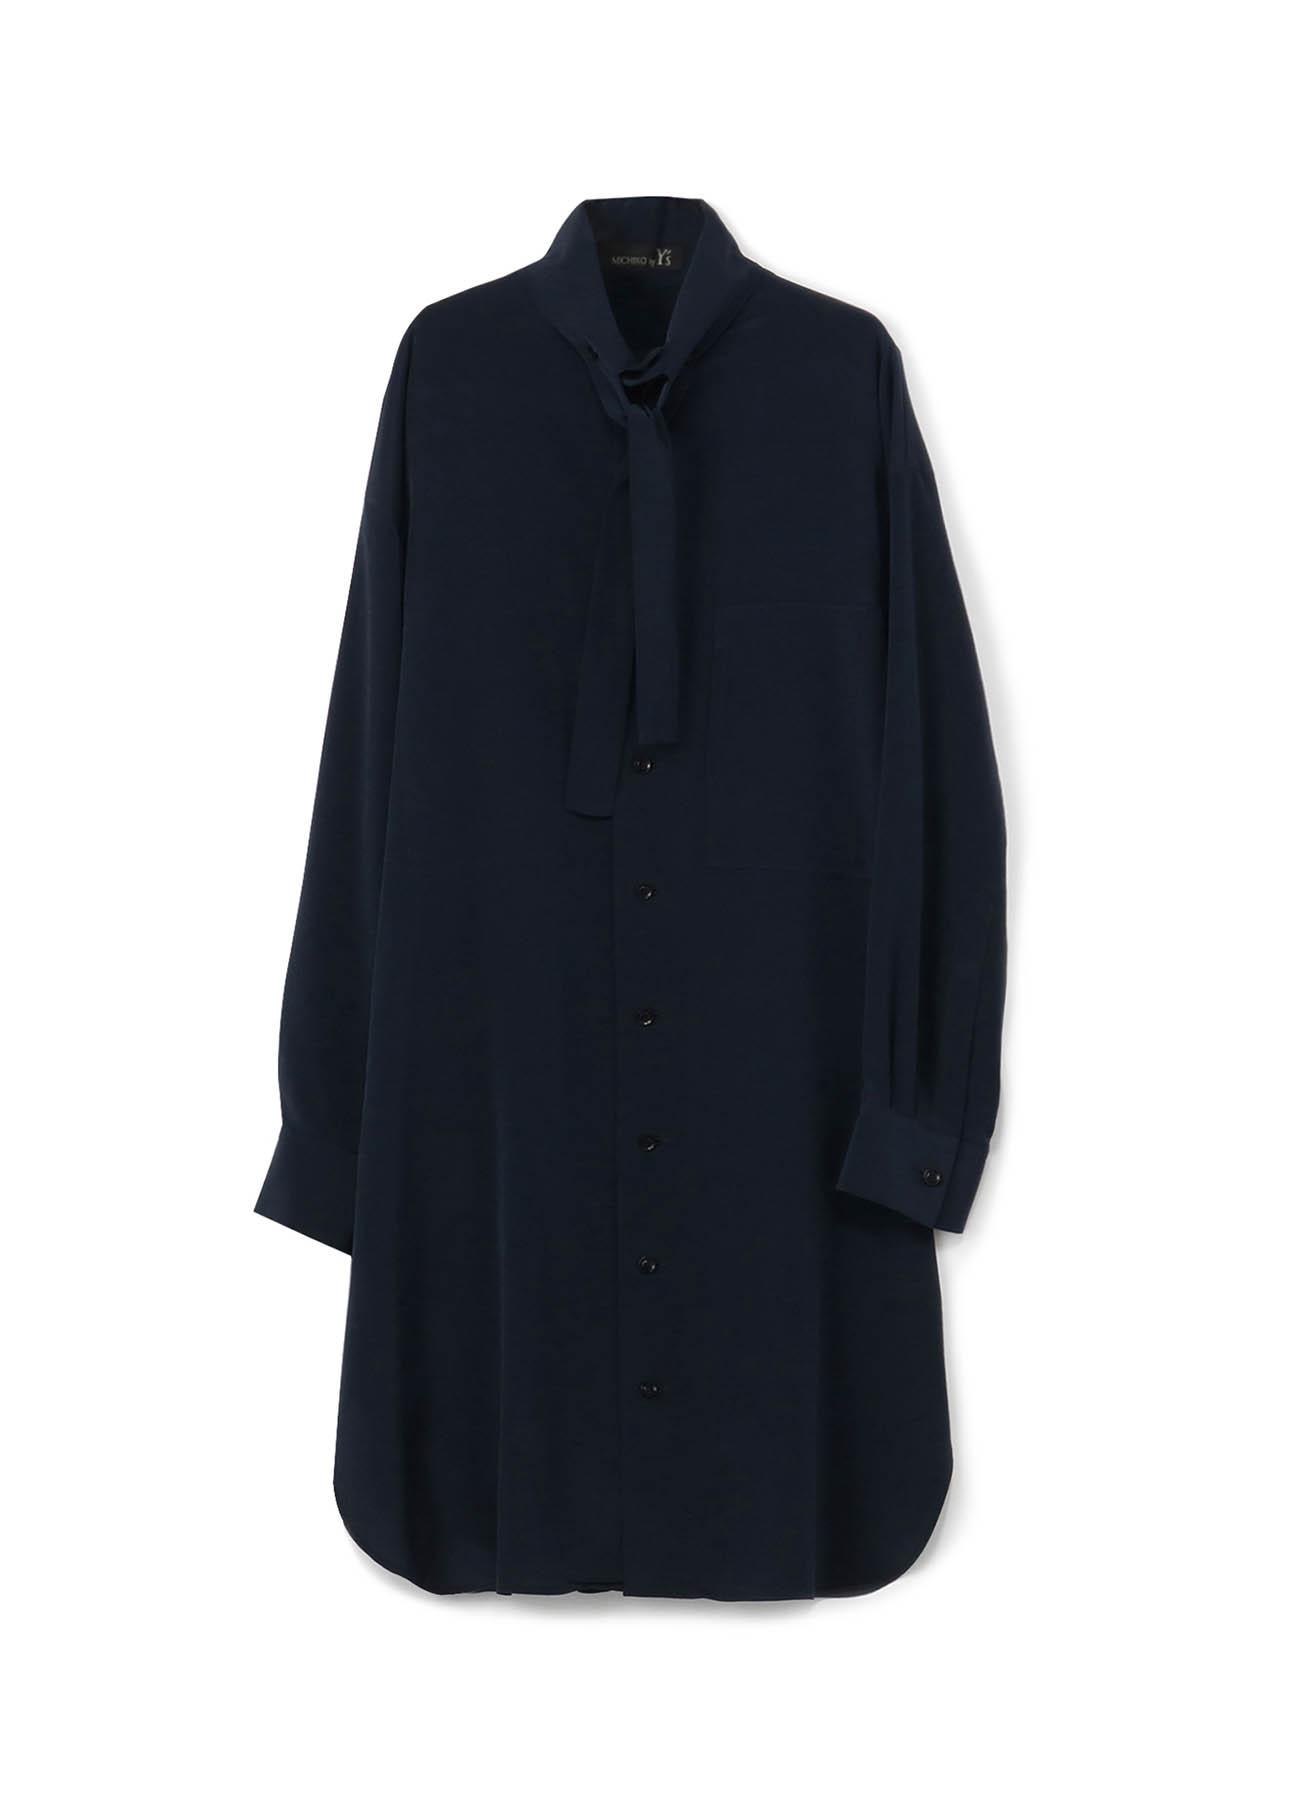 MICHIKObyY's 薄デシン タイ付シャツドレス